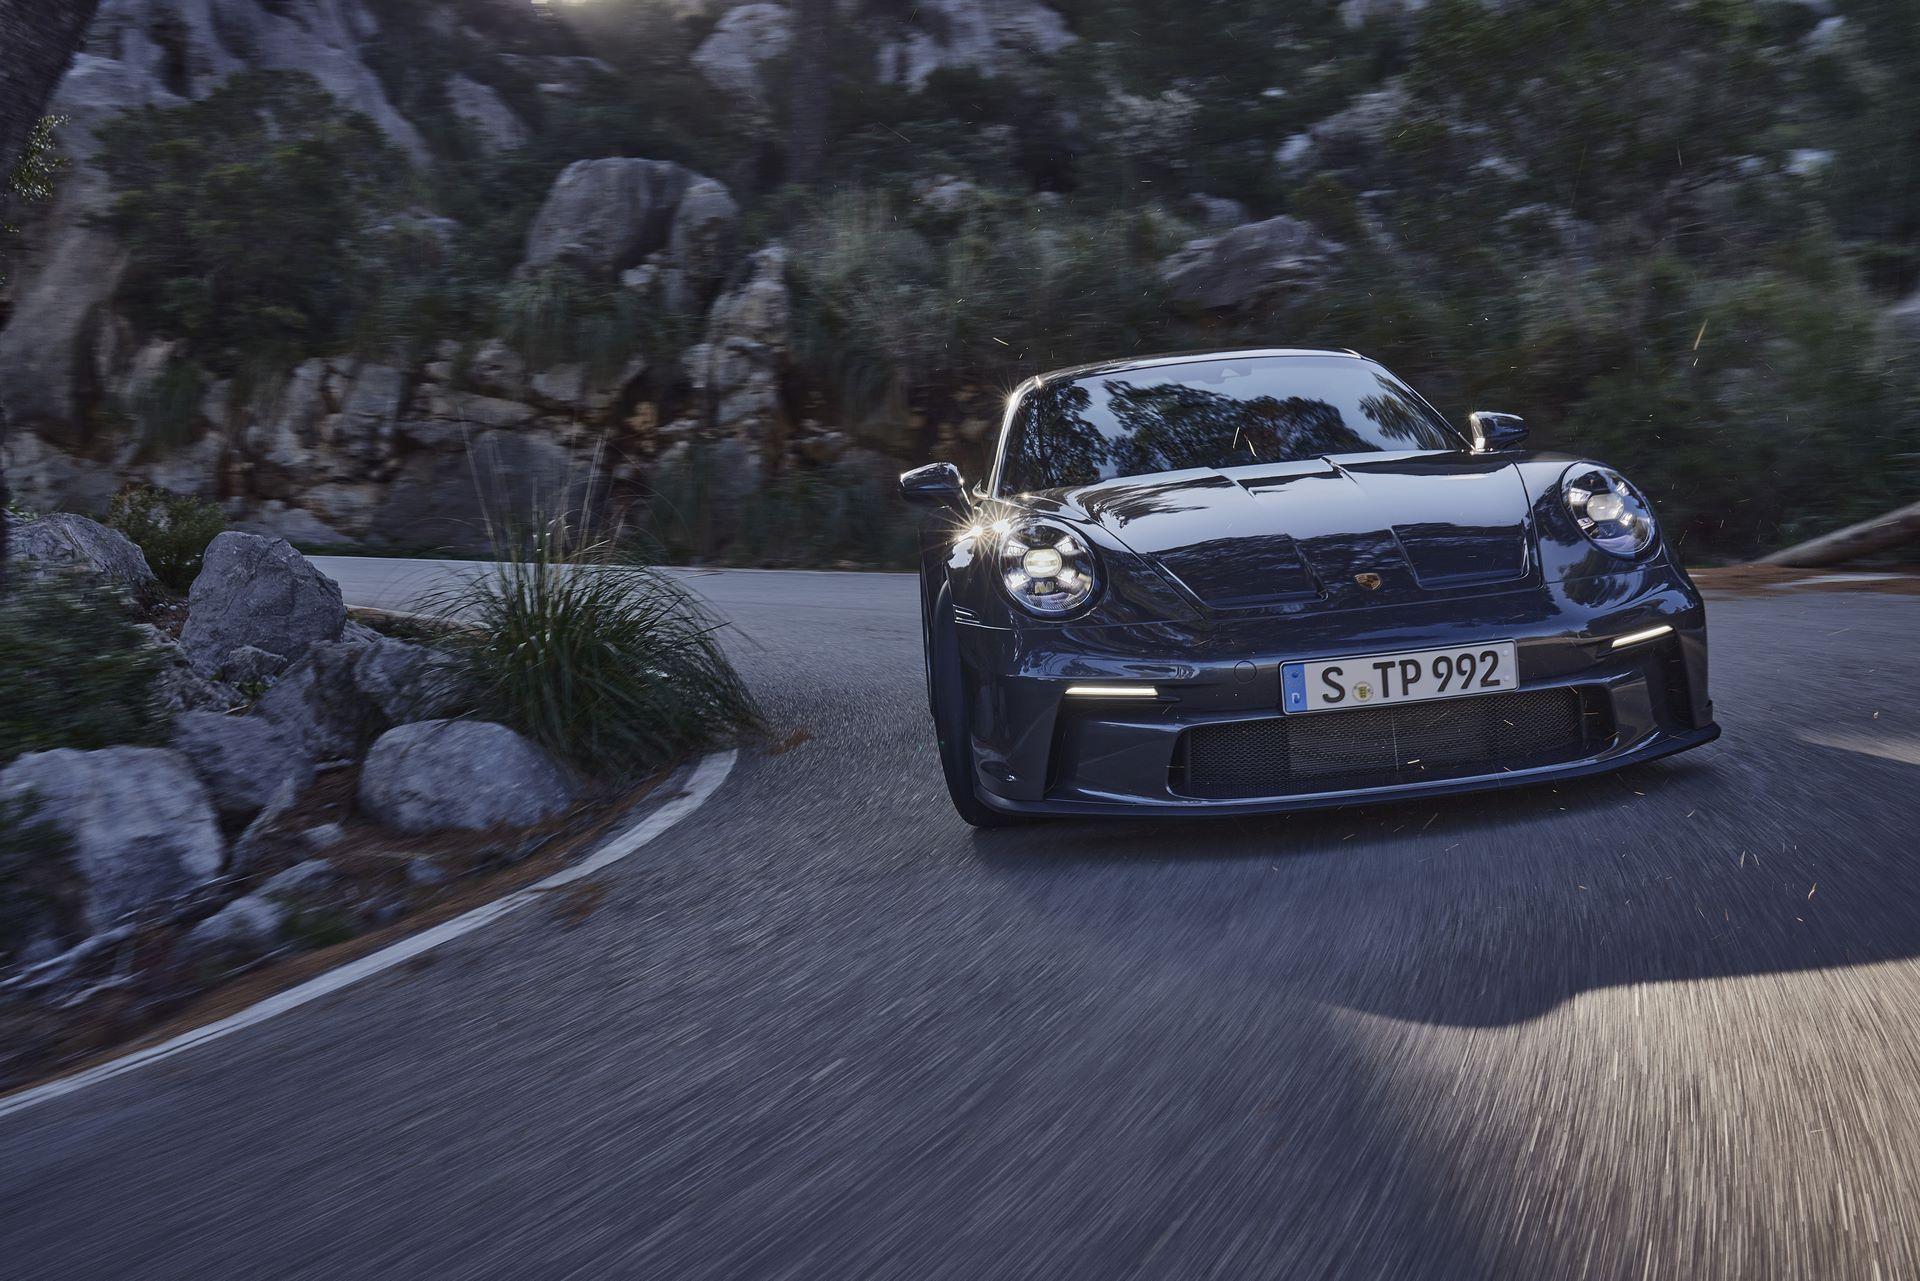 Porsche-911-GT3-Touring-Package-14